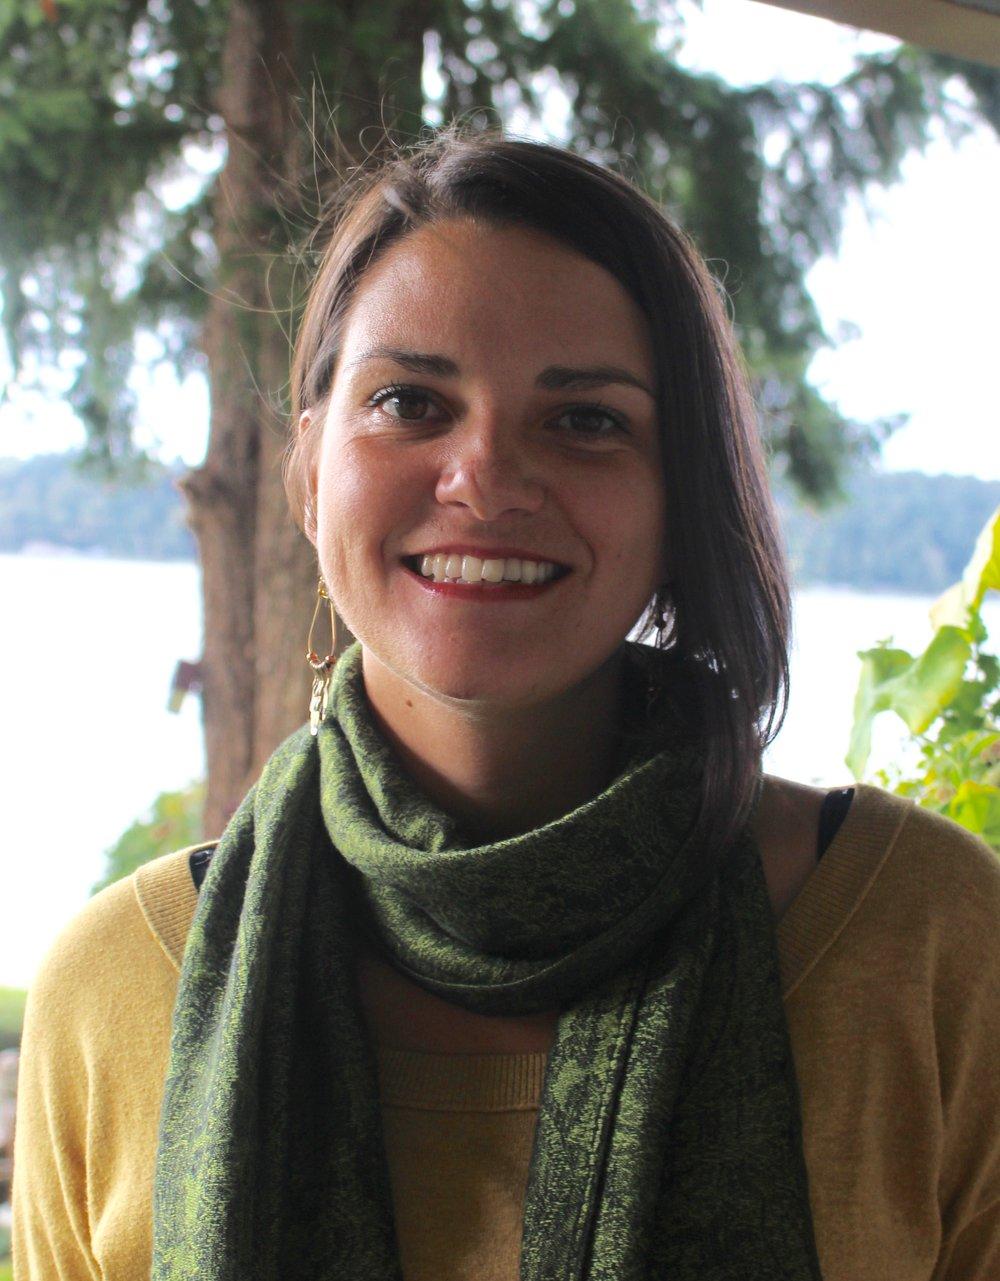 Sara Kiely